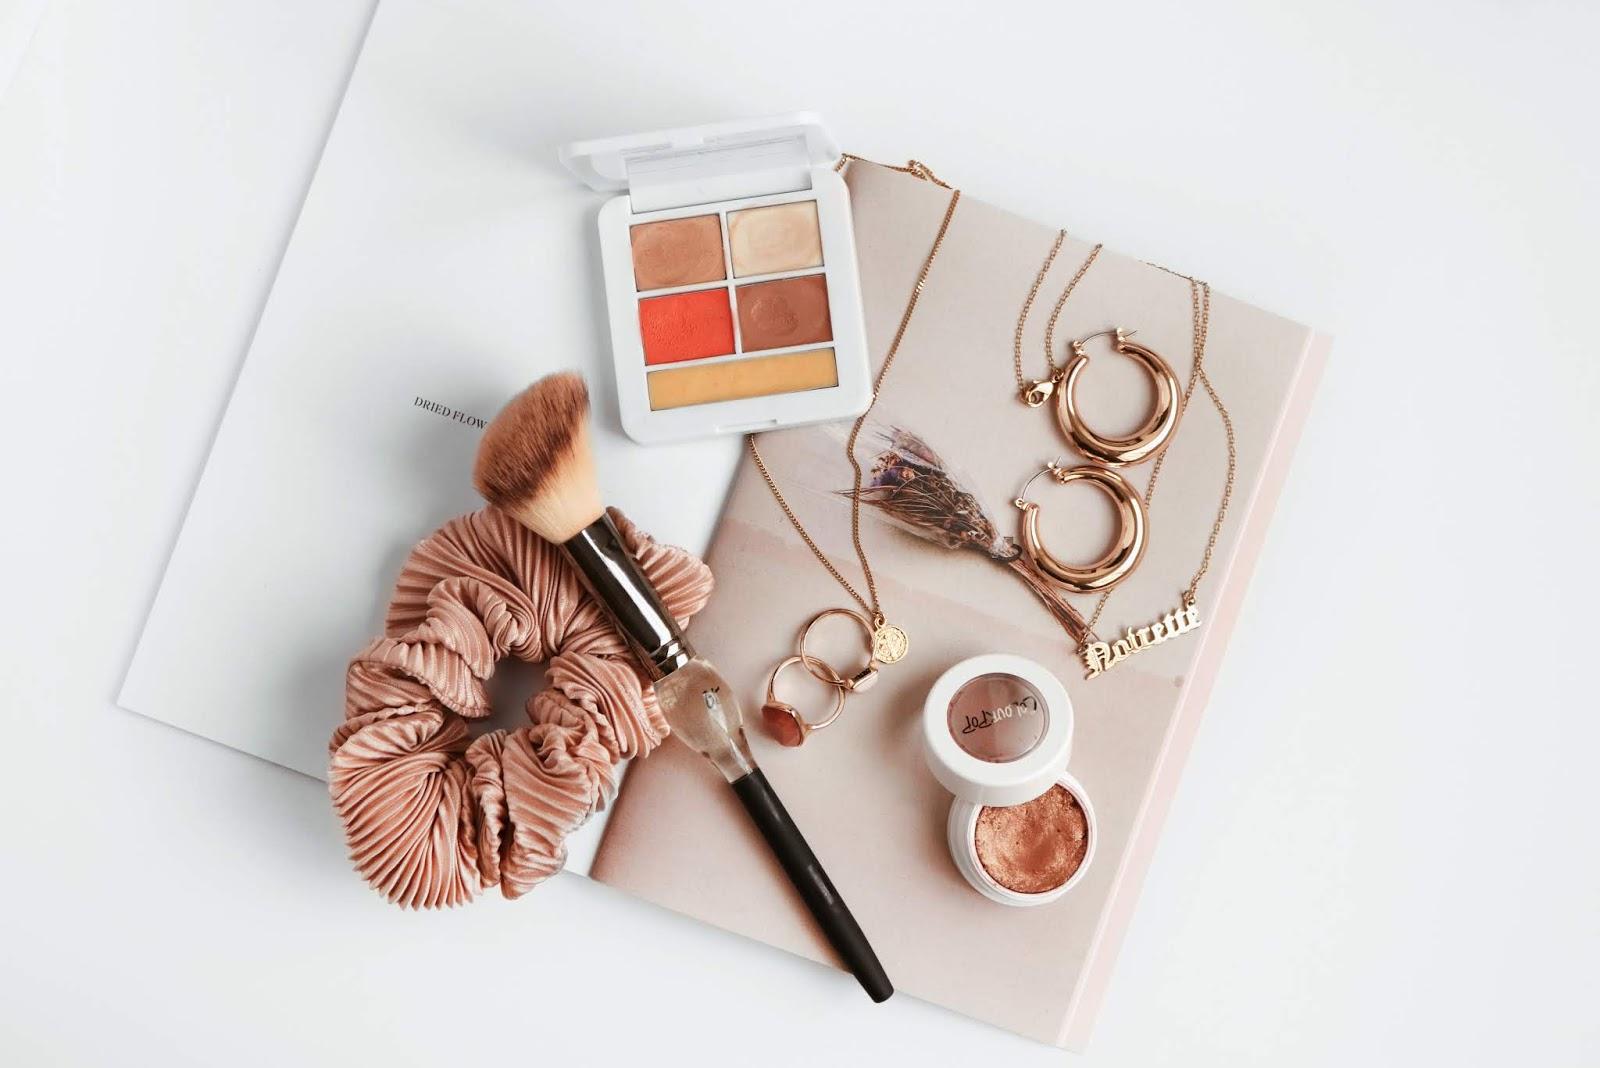 spring 2020 beauty wishlist makeup